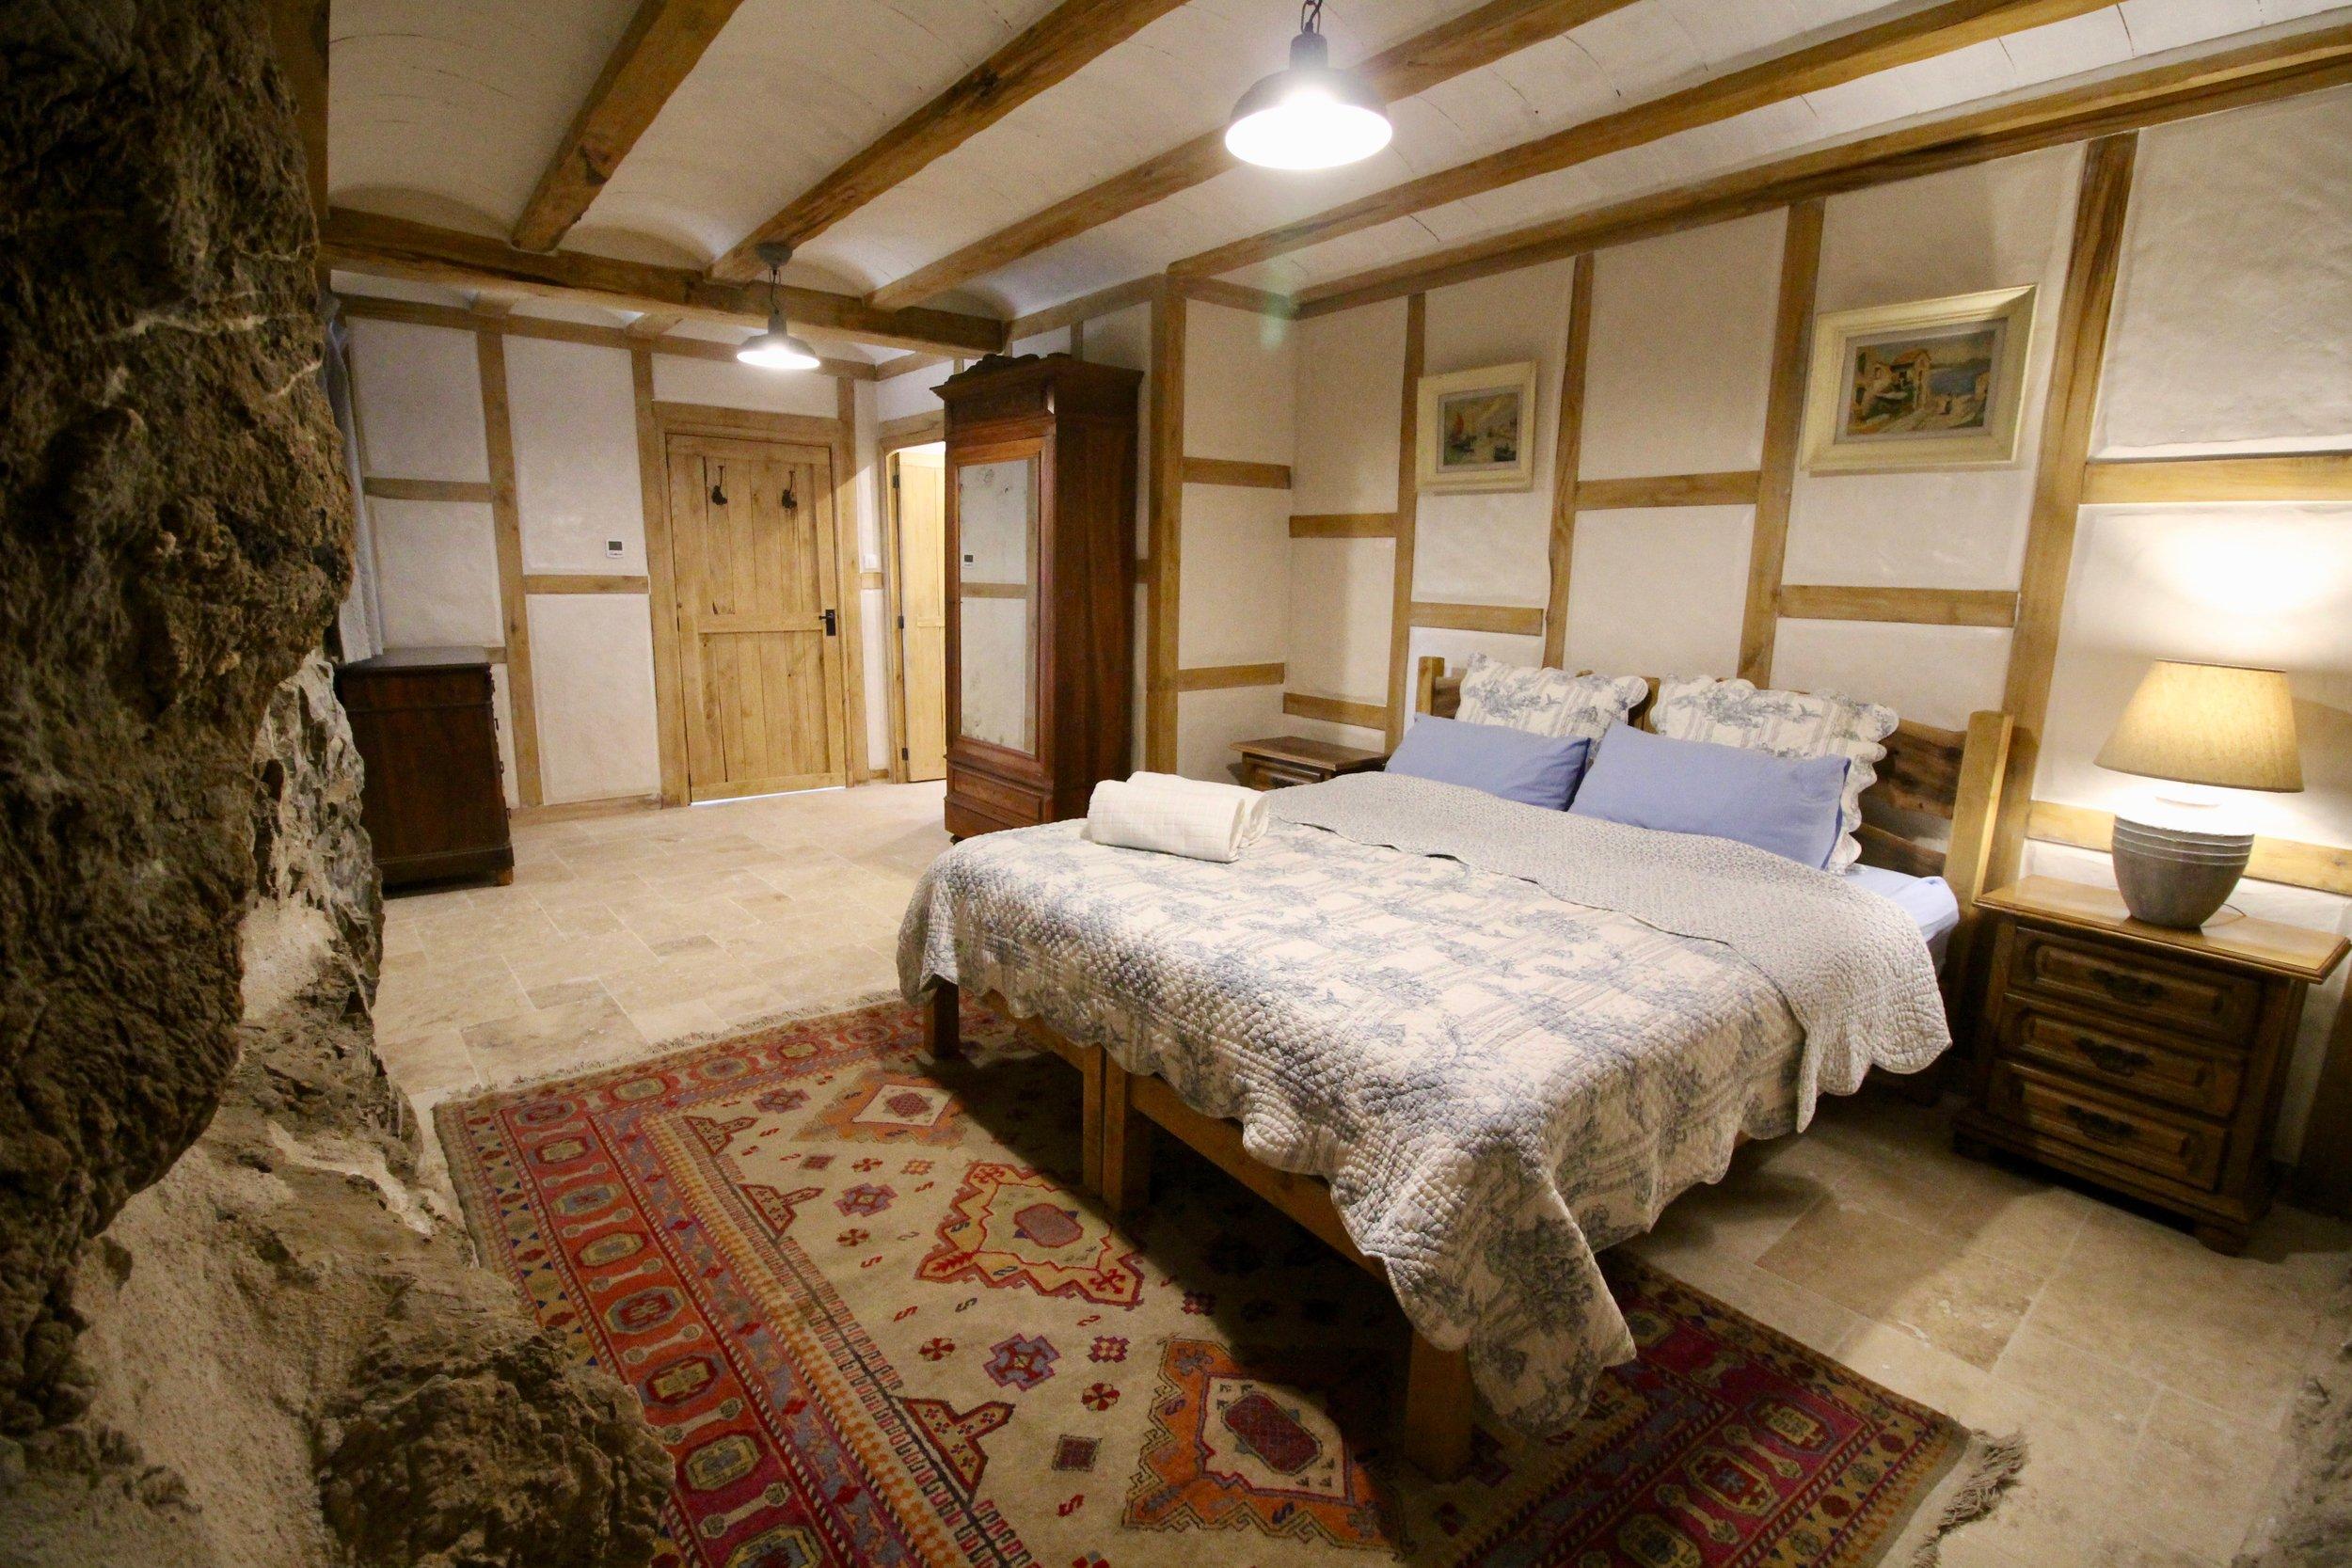 Doors, walls, ceiling caps, bed